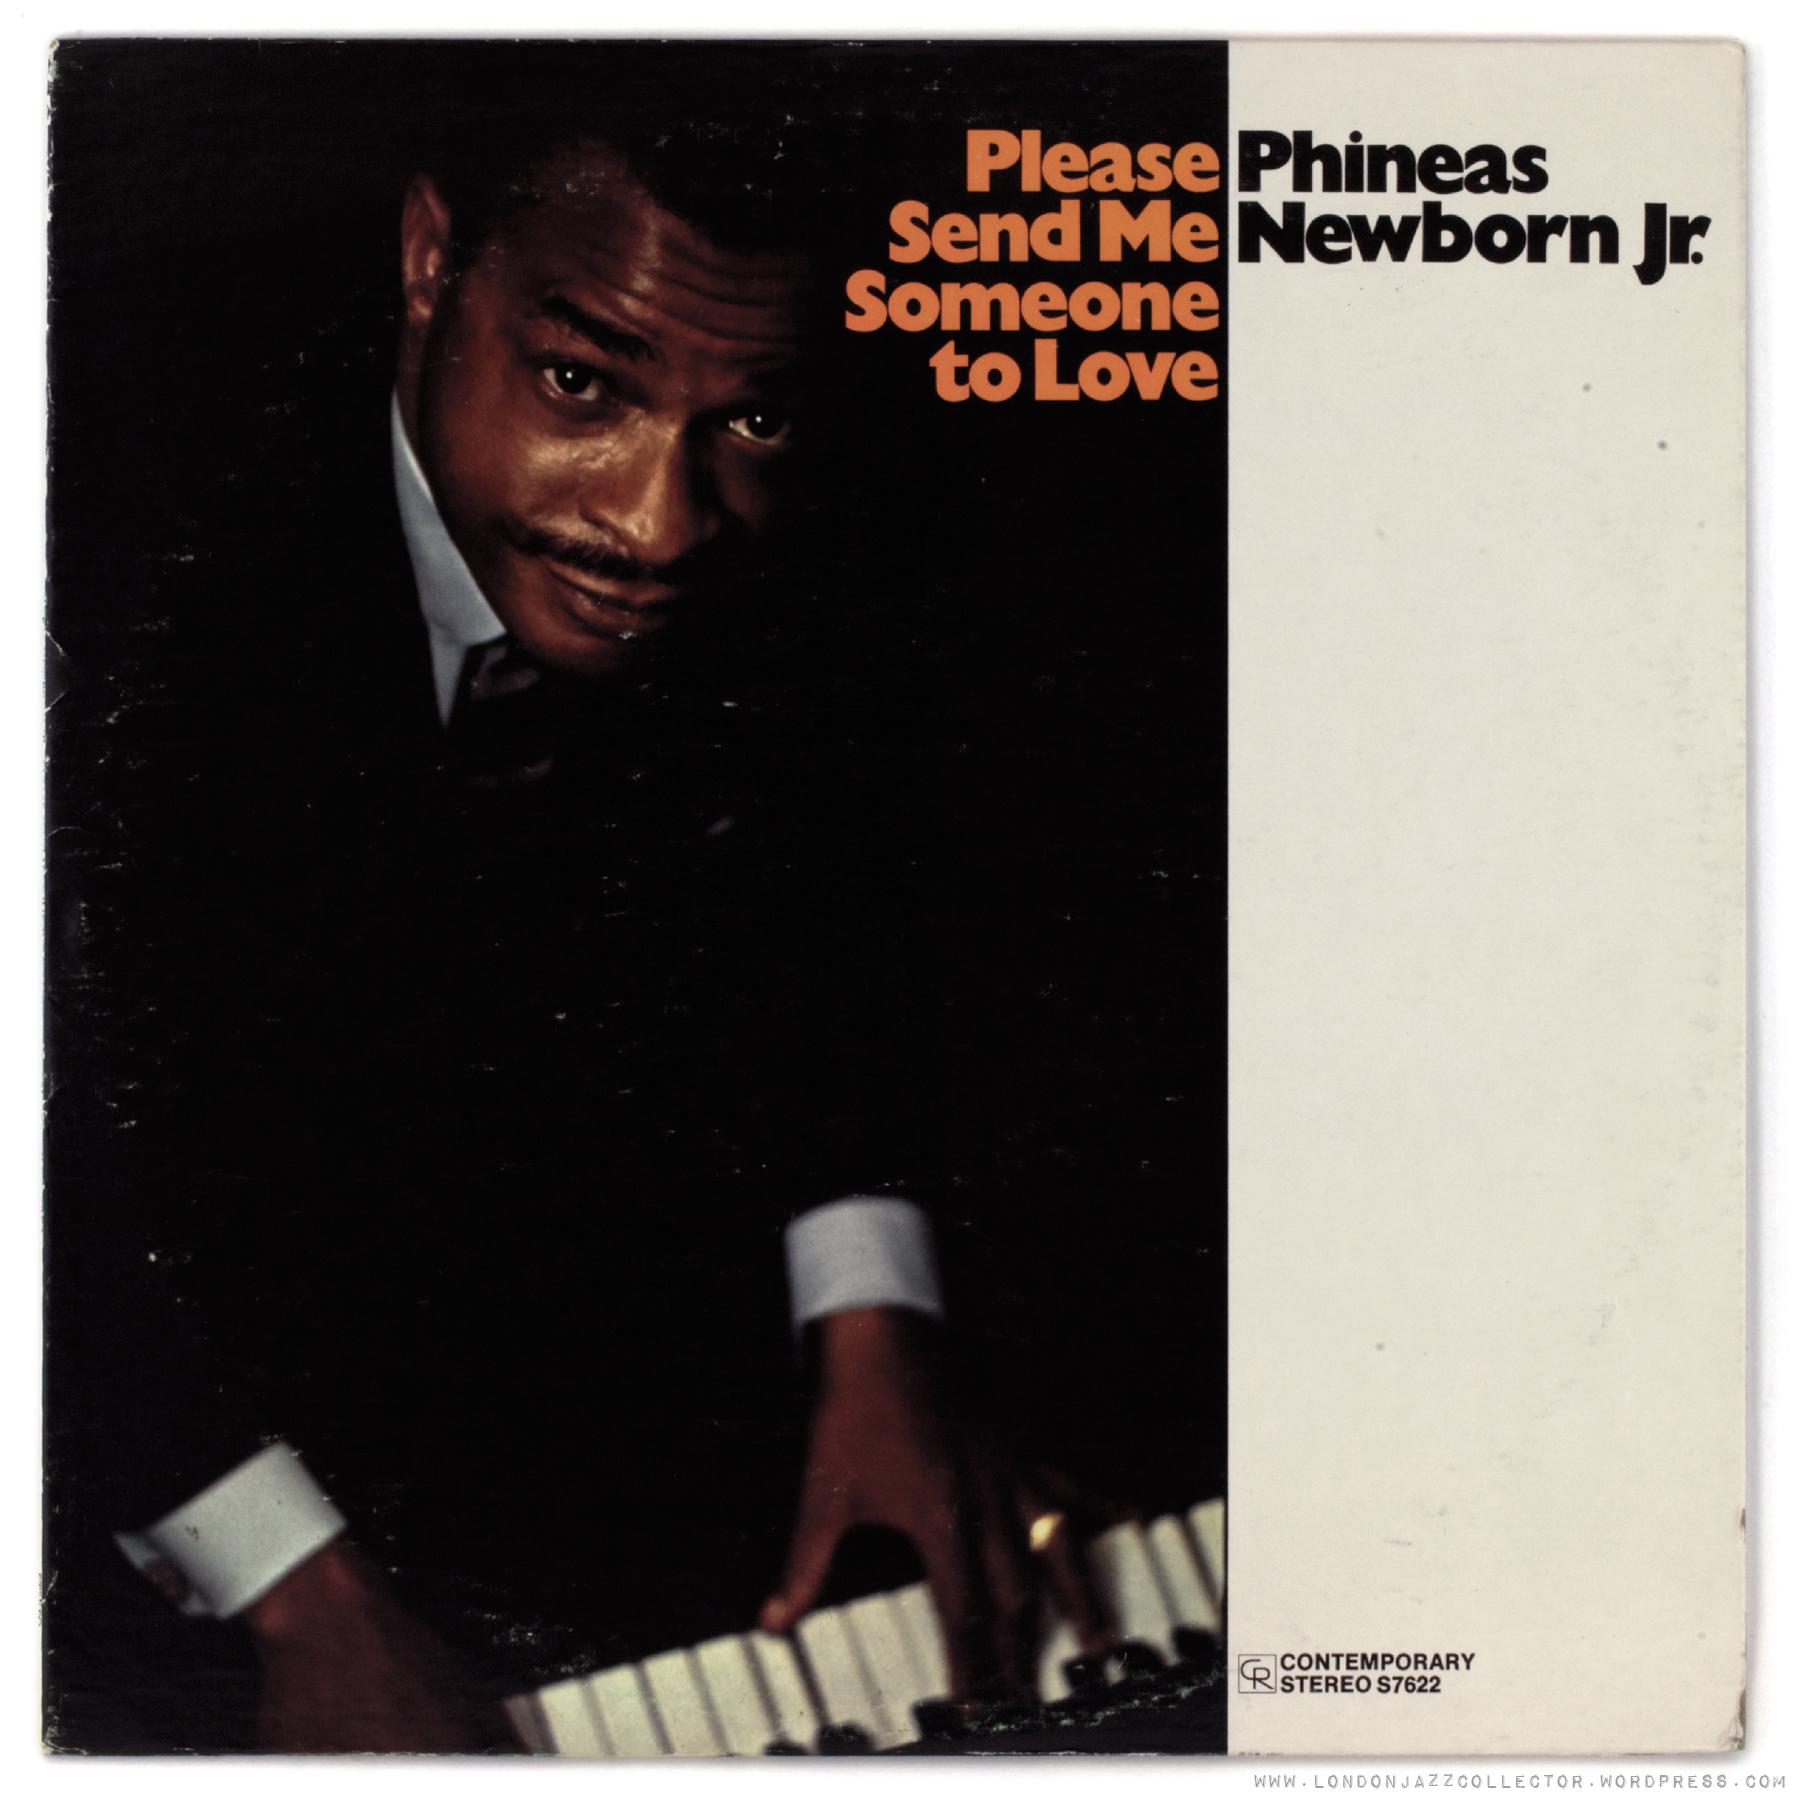 Phineas-Newborn-Please-sens-me-someone-to-love-cover-1800-LJC-1